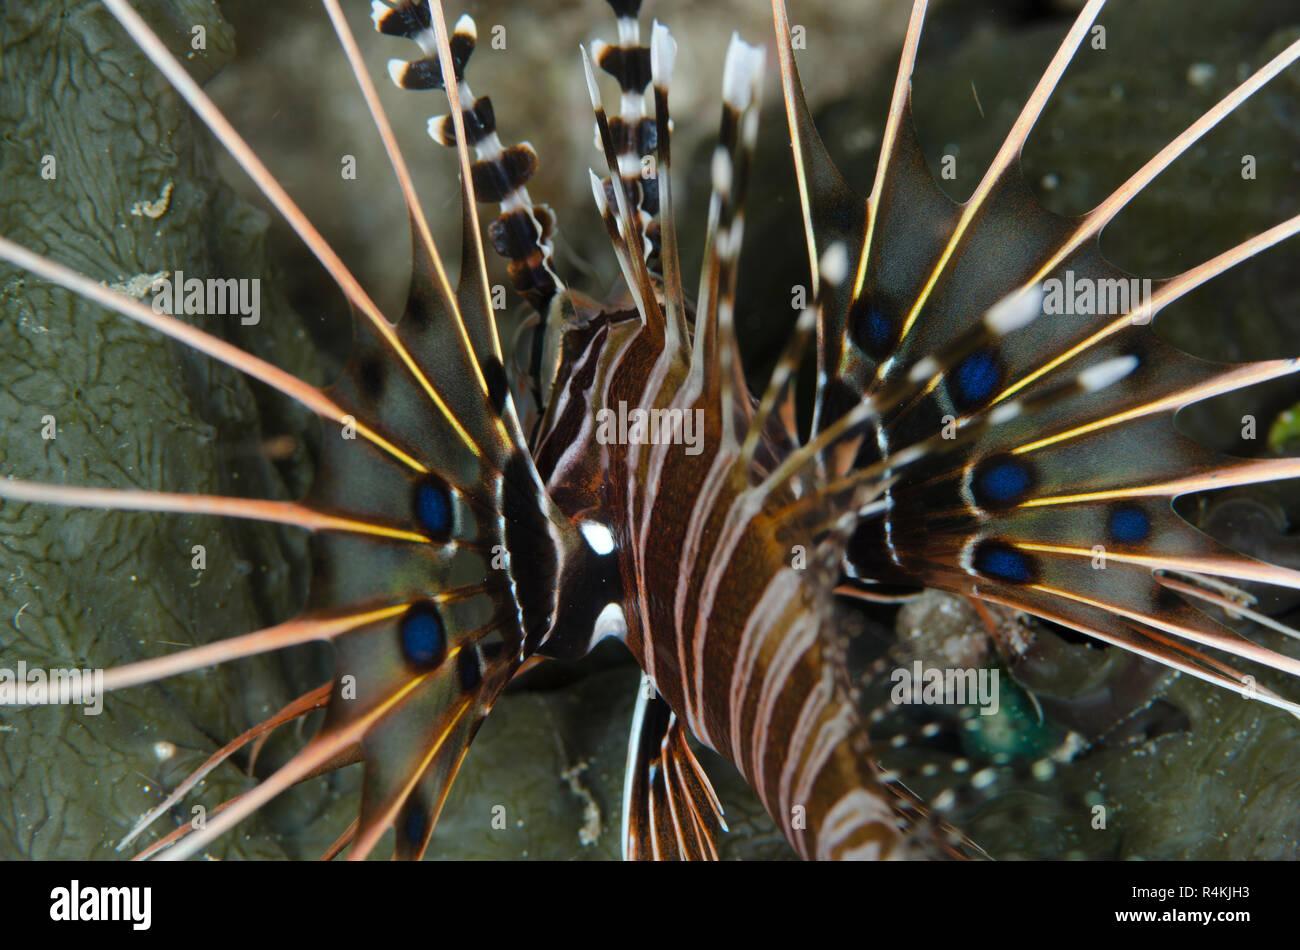 Spotfin Lionfish, Pterois antennata, Coconut Point dive site, off Reta Island, near Alor, Indonesia - Stock Image